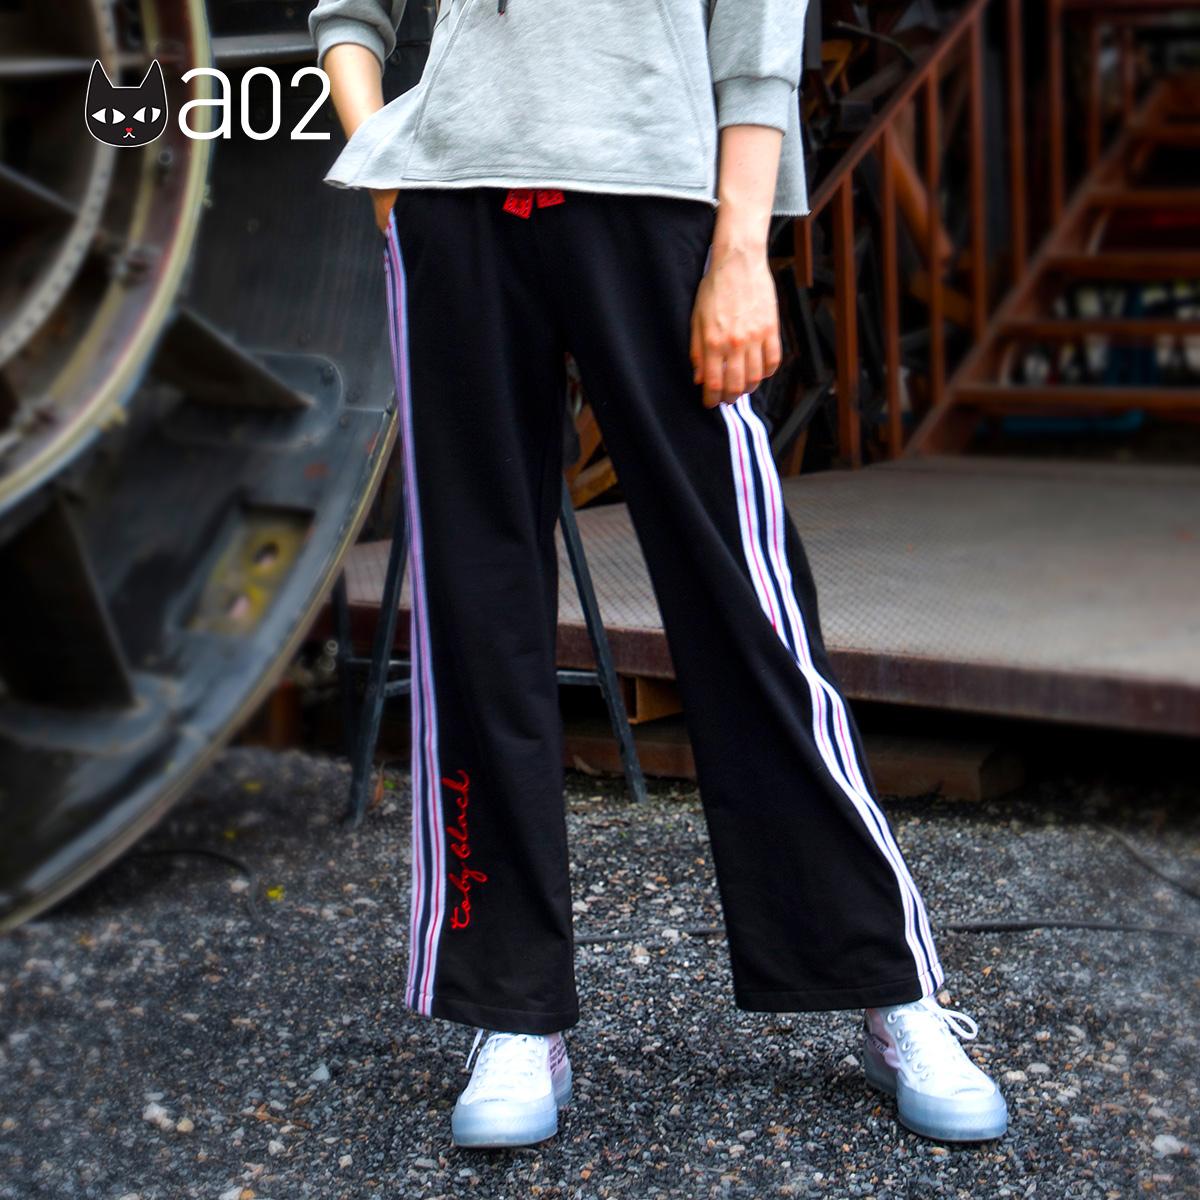 a02新款2018春秋大码侧边条纹运动休闲长裤阔腿裤女DTT5A0711PN